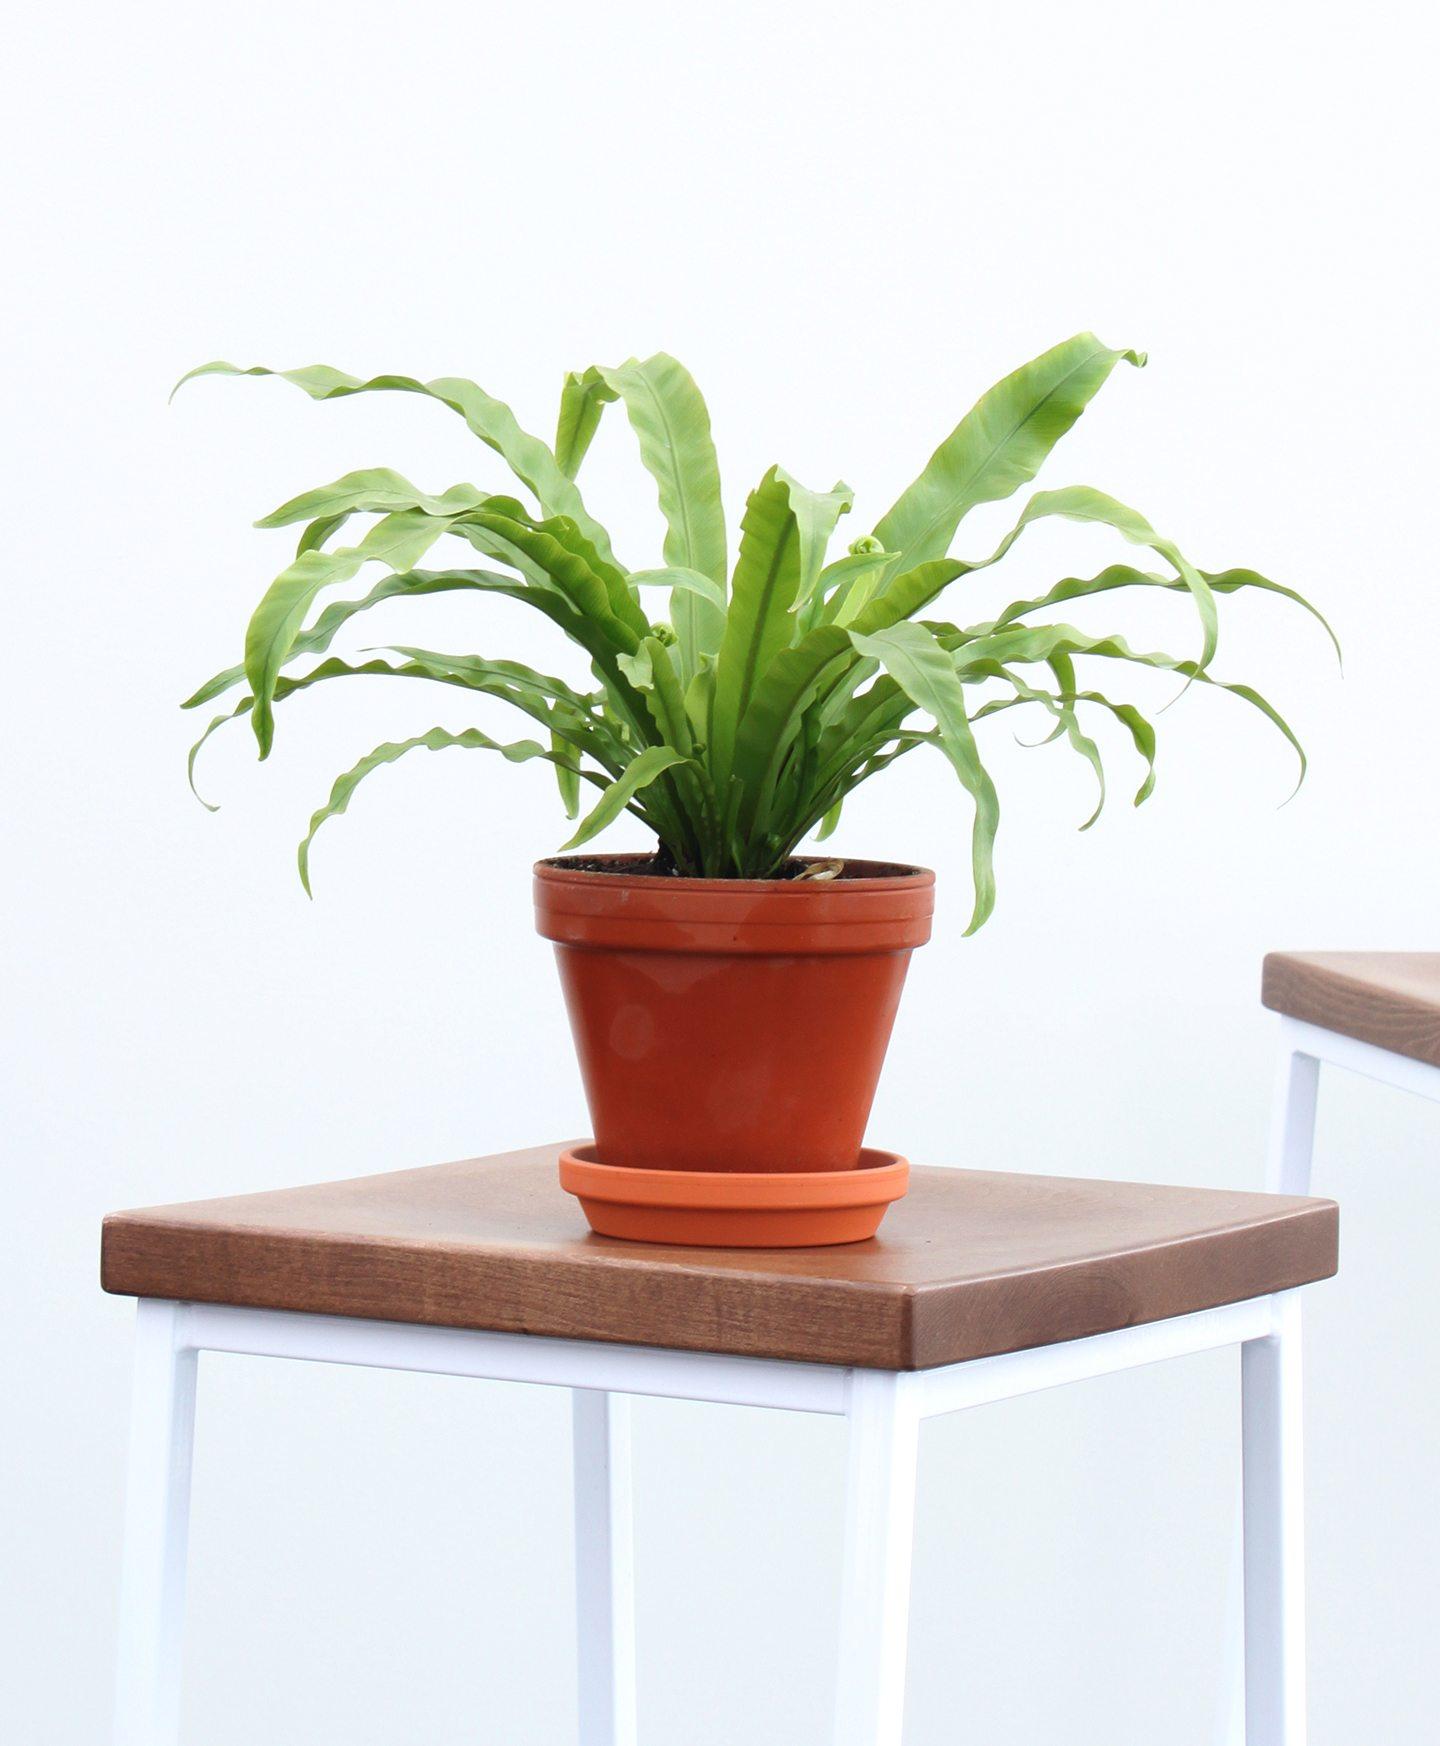 picture-of-birds-nest-fern-houseplant-photo1